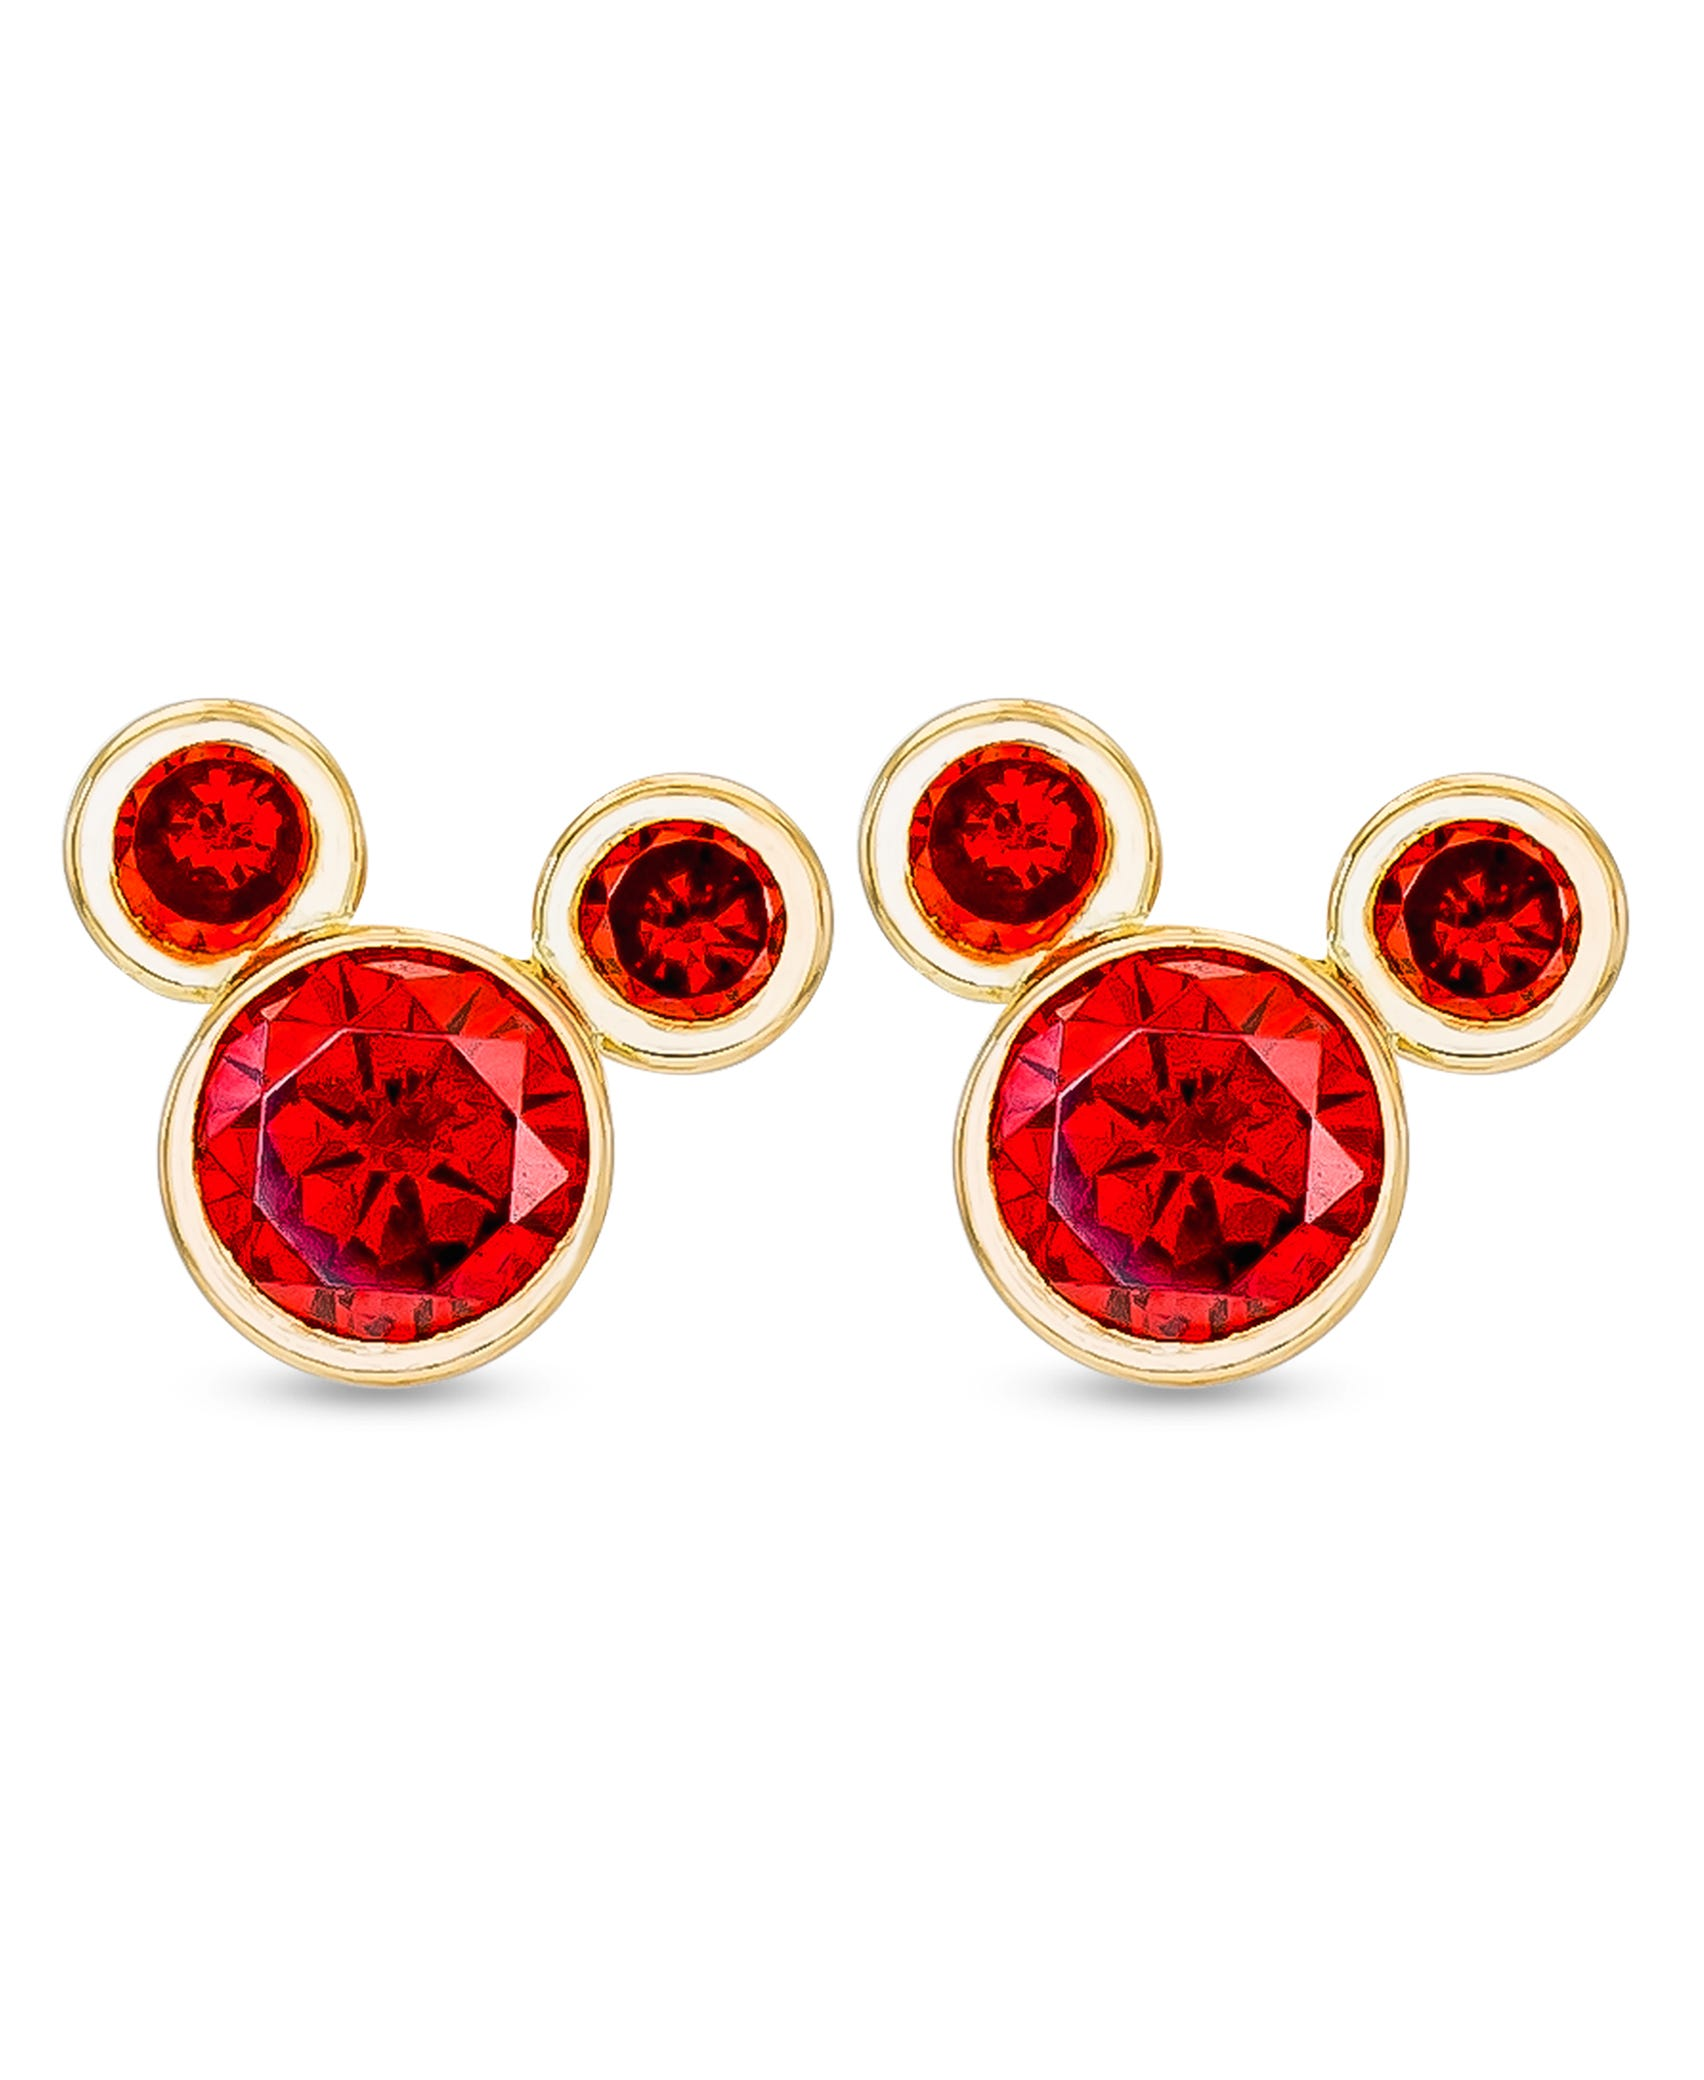 DISNEY© Mickey Mouse January Birthstone CZ Stud Earrings in 14k Yellow Gold